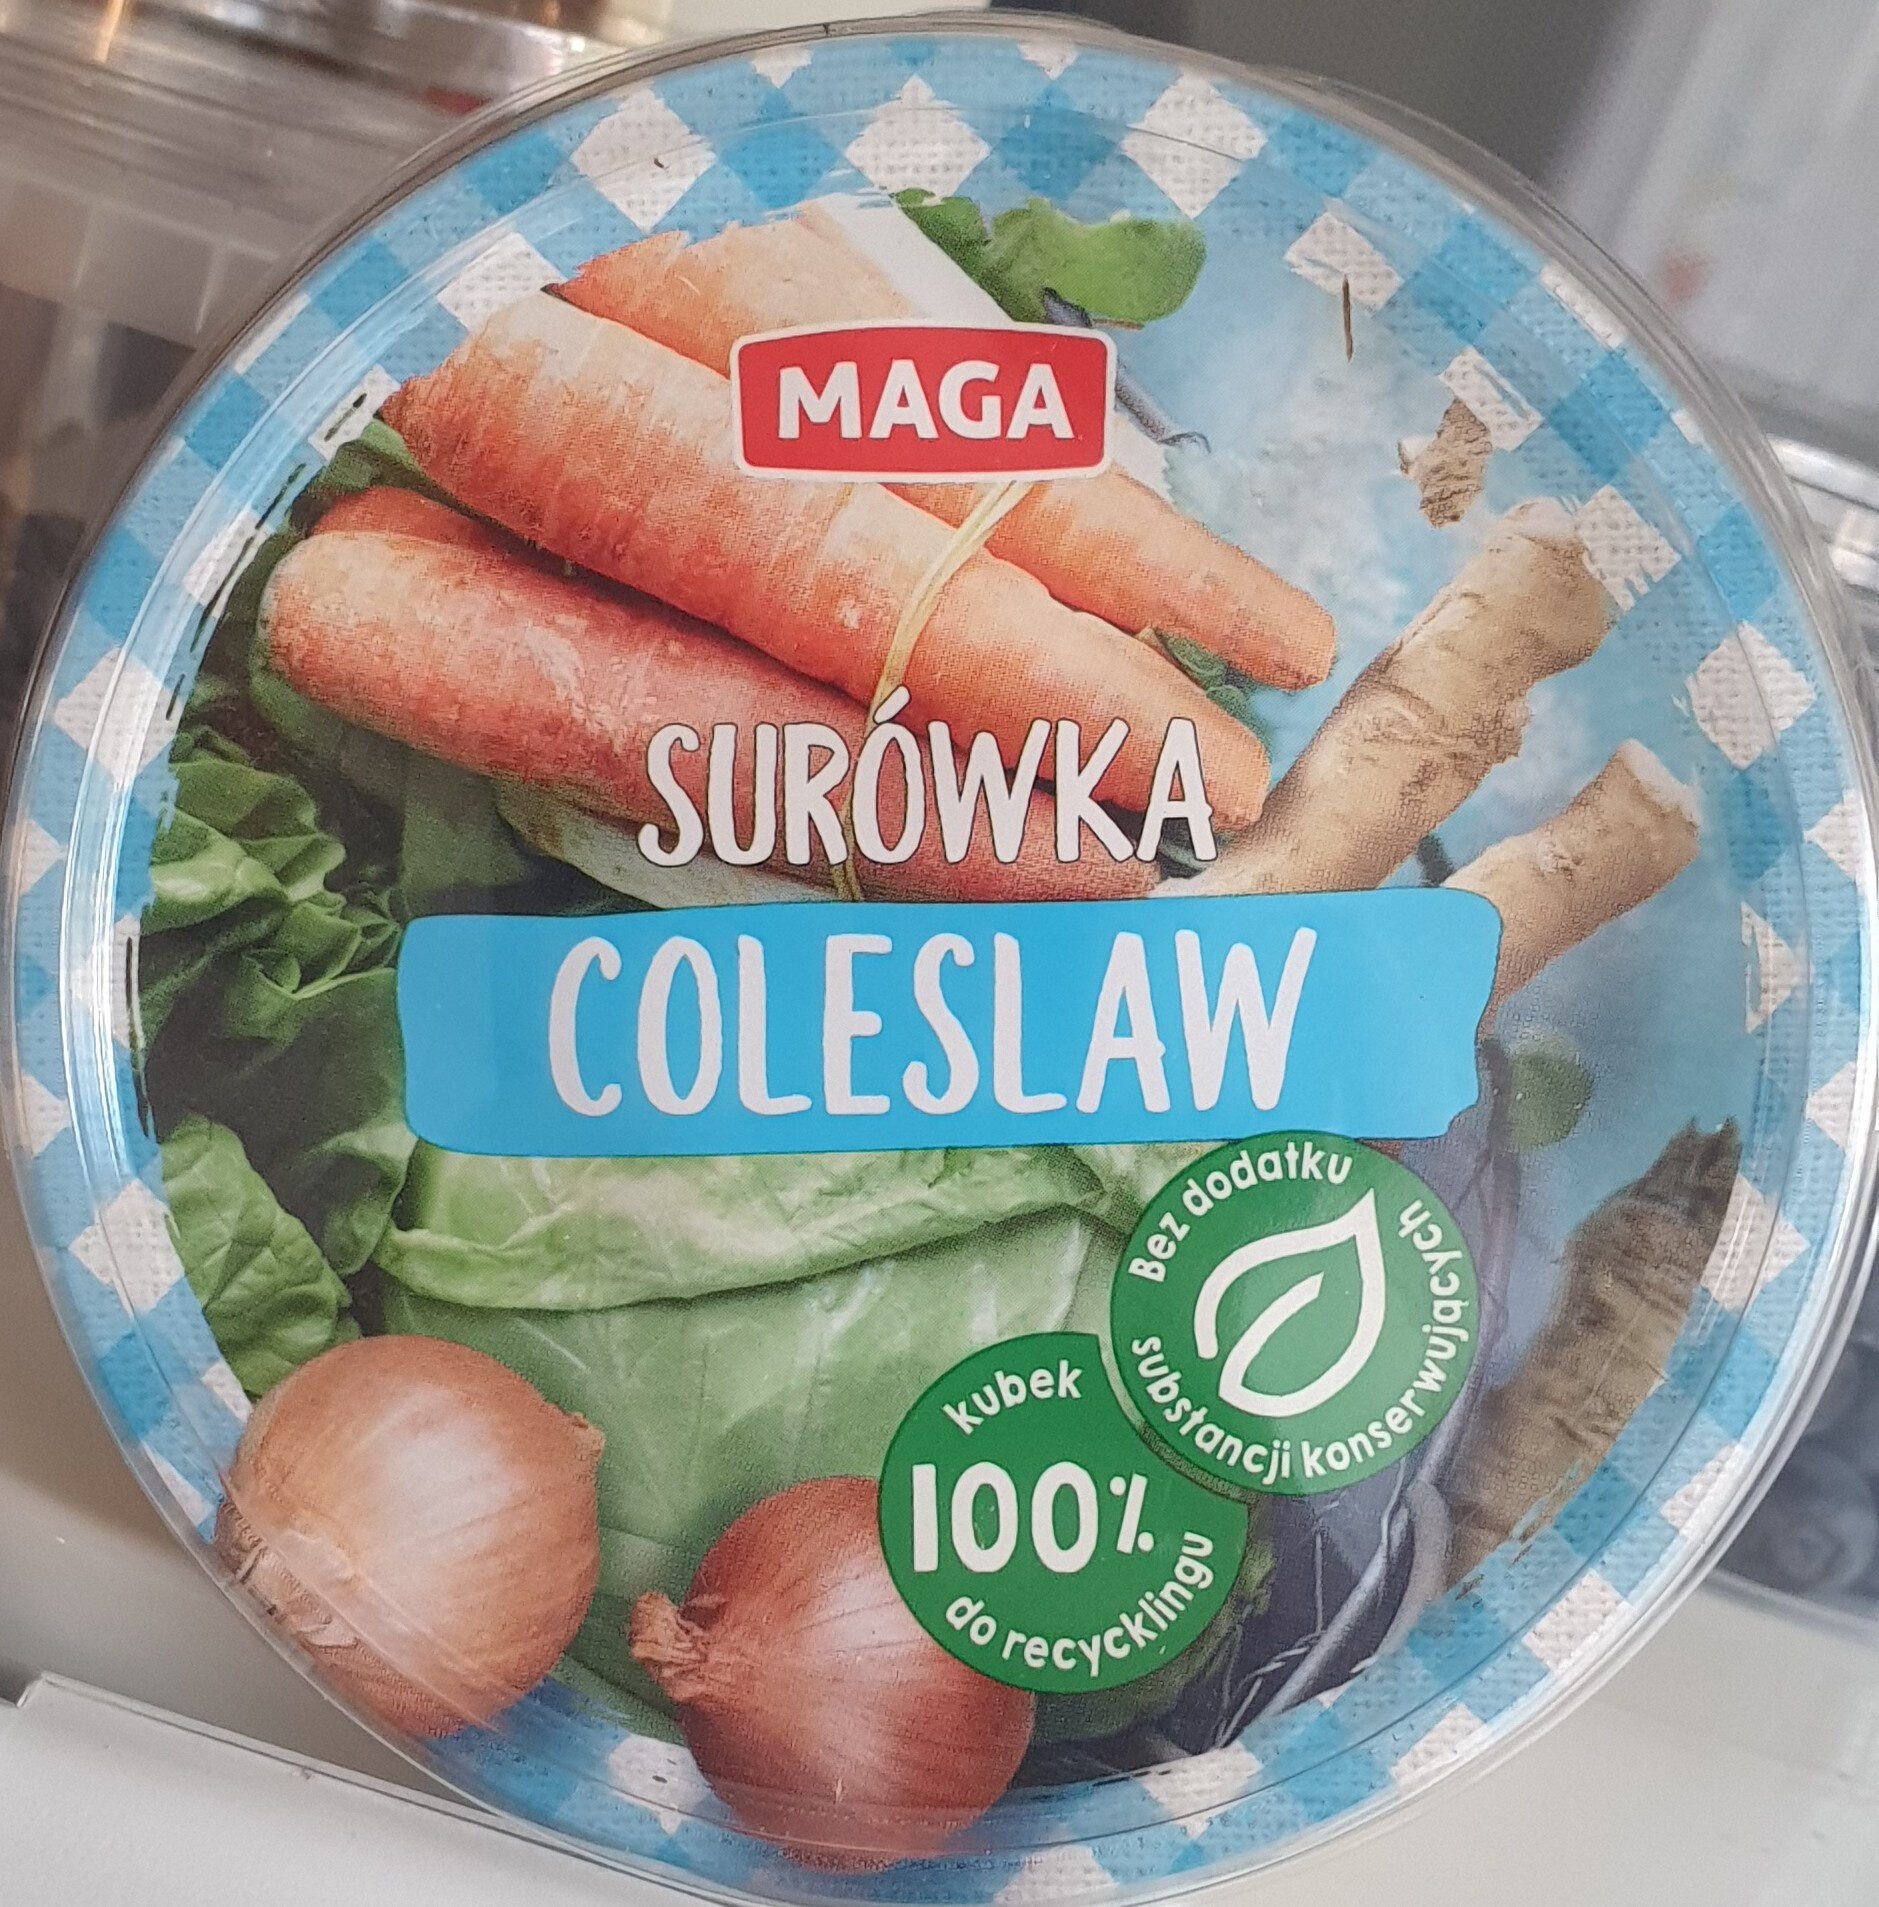 Surówka Colesław - Produkt - pl